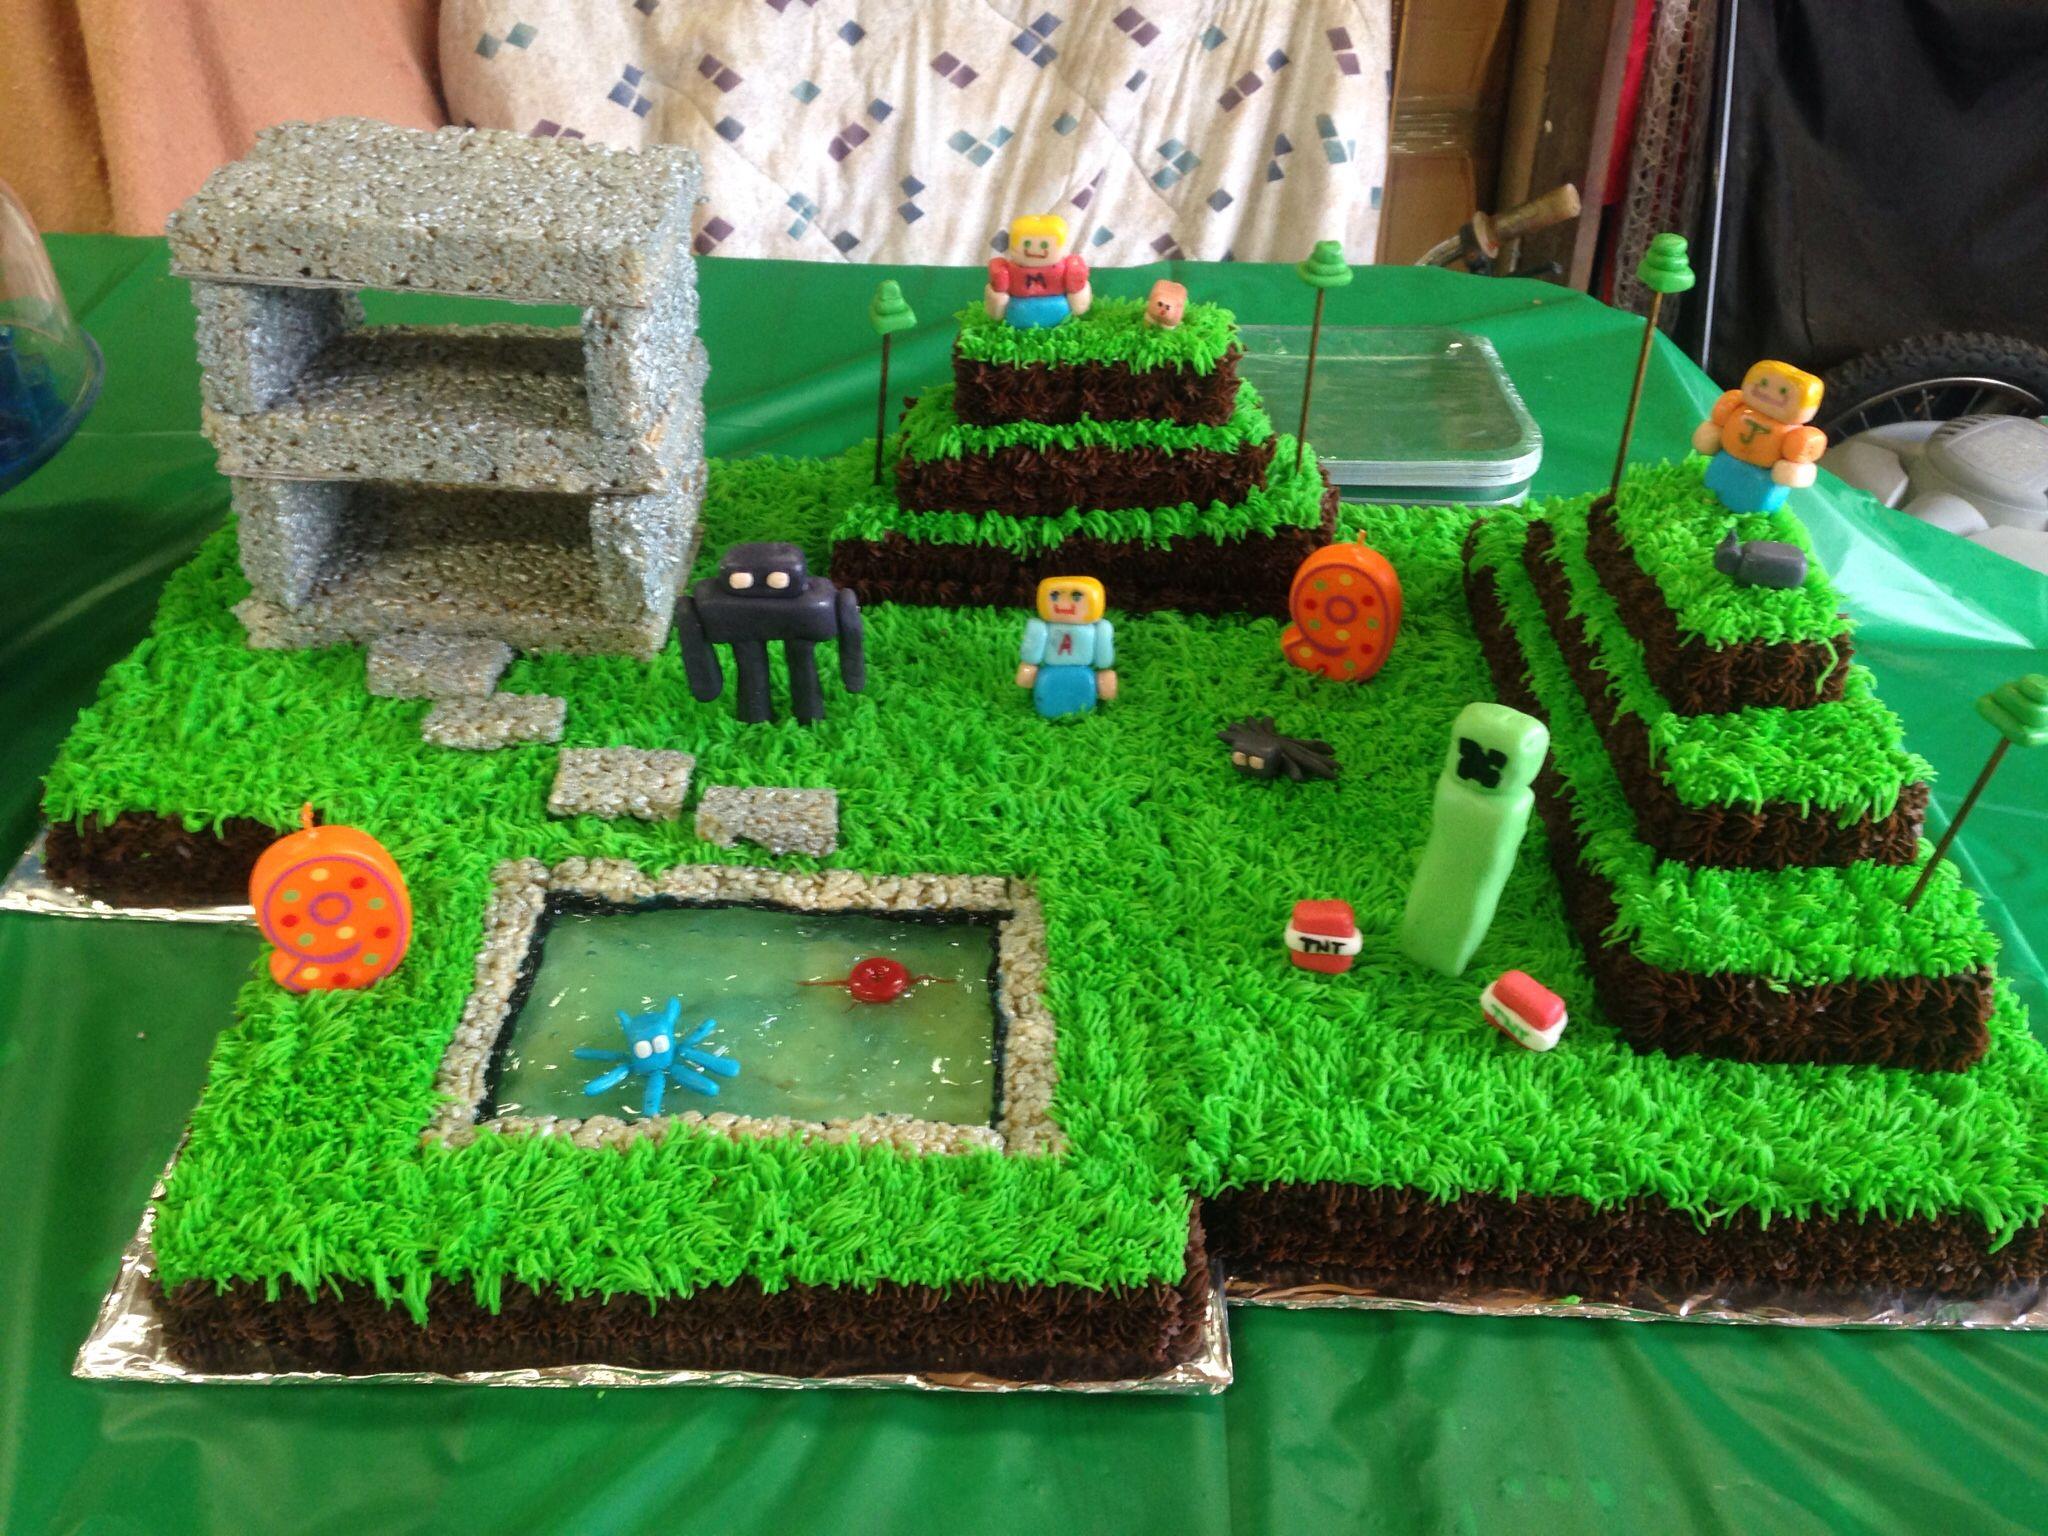 Phenomenal Coolest Minecraft Cake Minecraft Birthday Cake Minecraft Personalised Birthday Cards Paralily Jamesorg